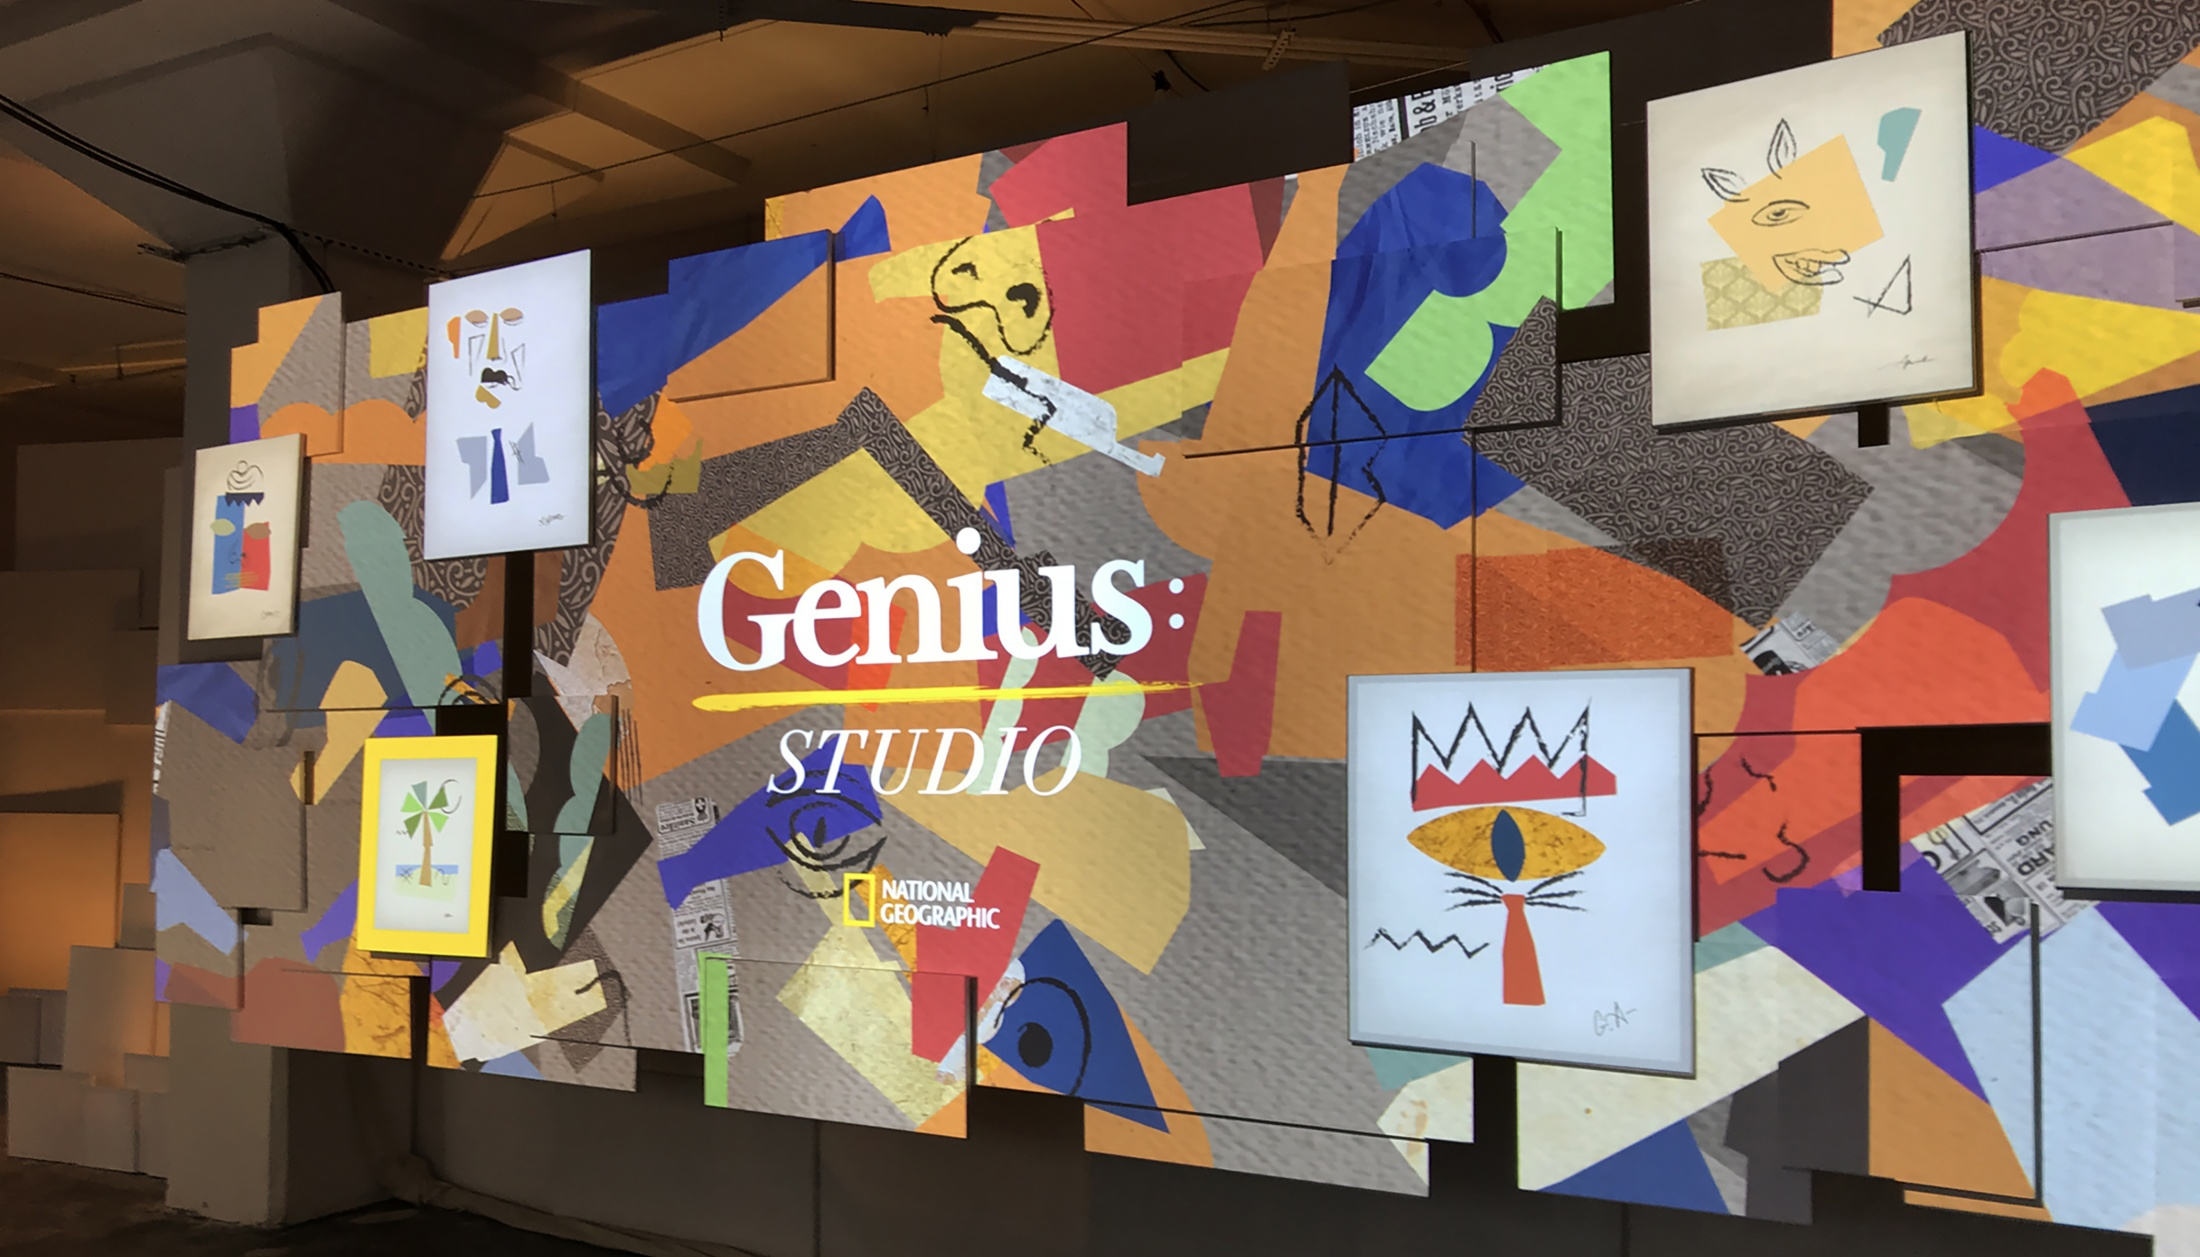 Thumbnail for Genius: Studio